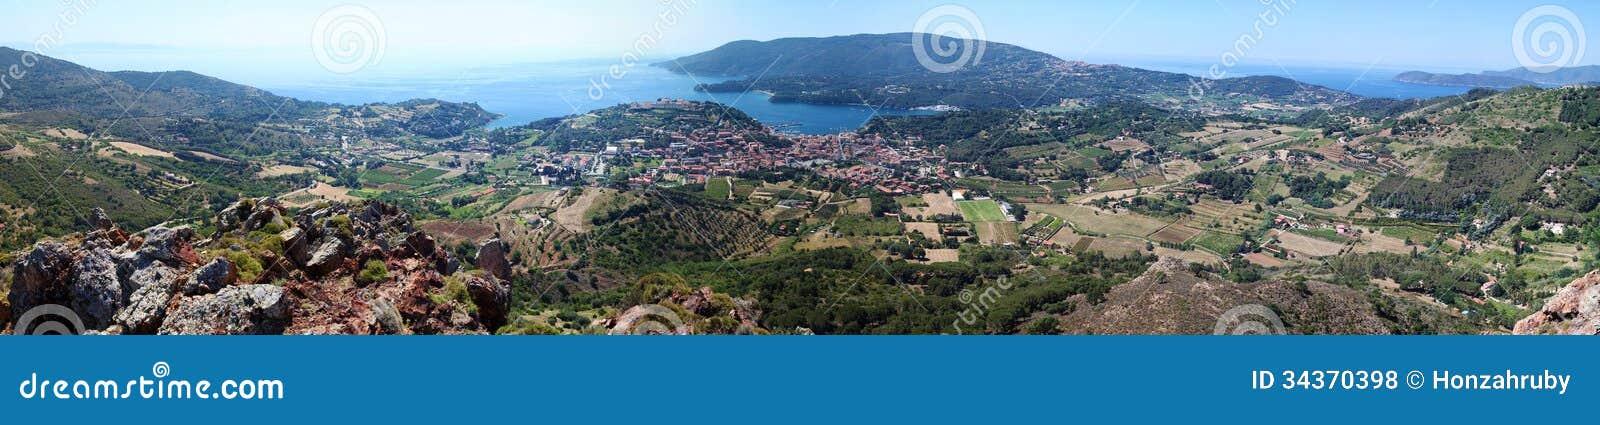 Panorama de la isla de Elba, Toscana, Italia, Europa